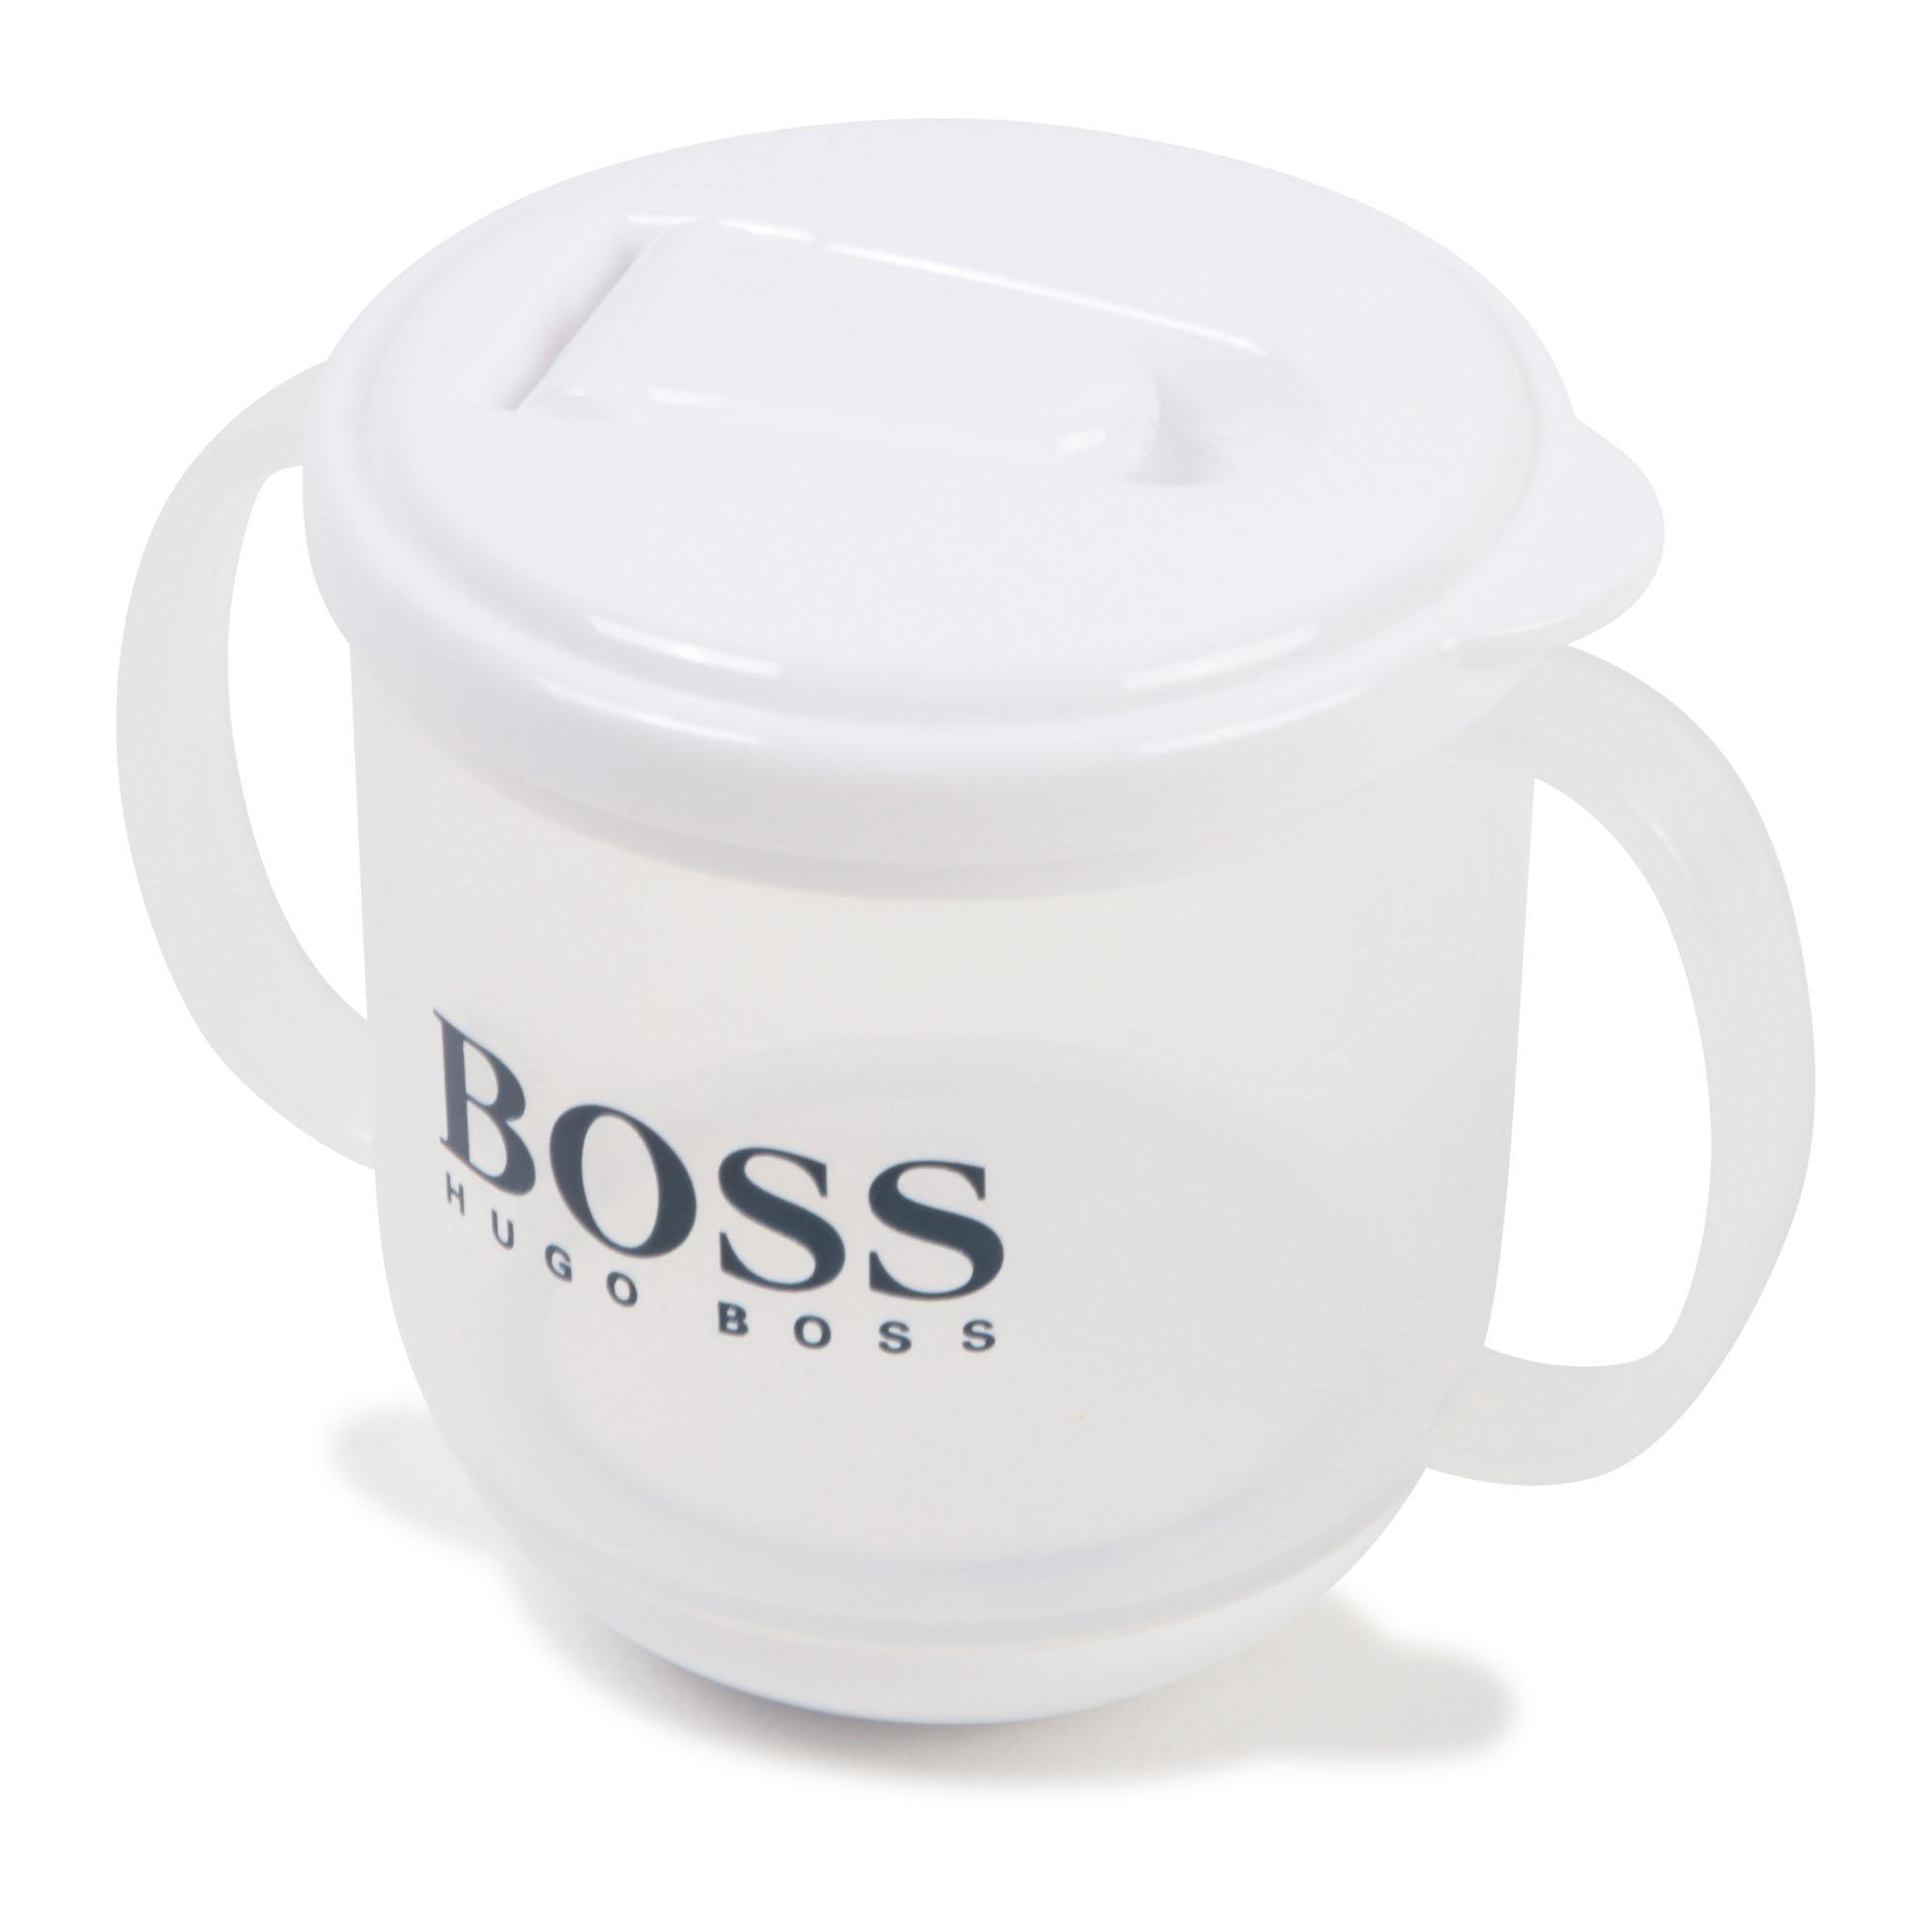 Hugo Boss baby cup - white